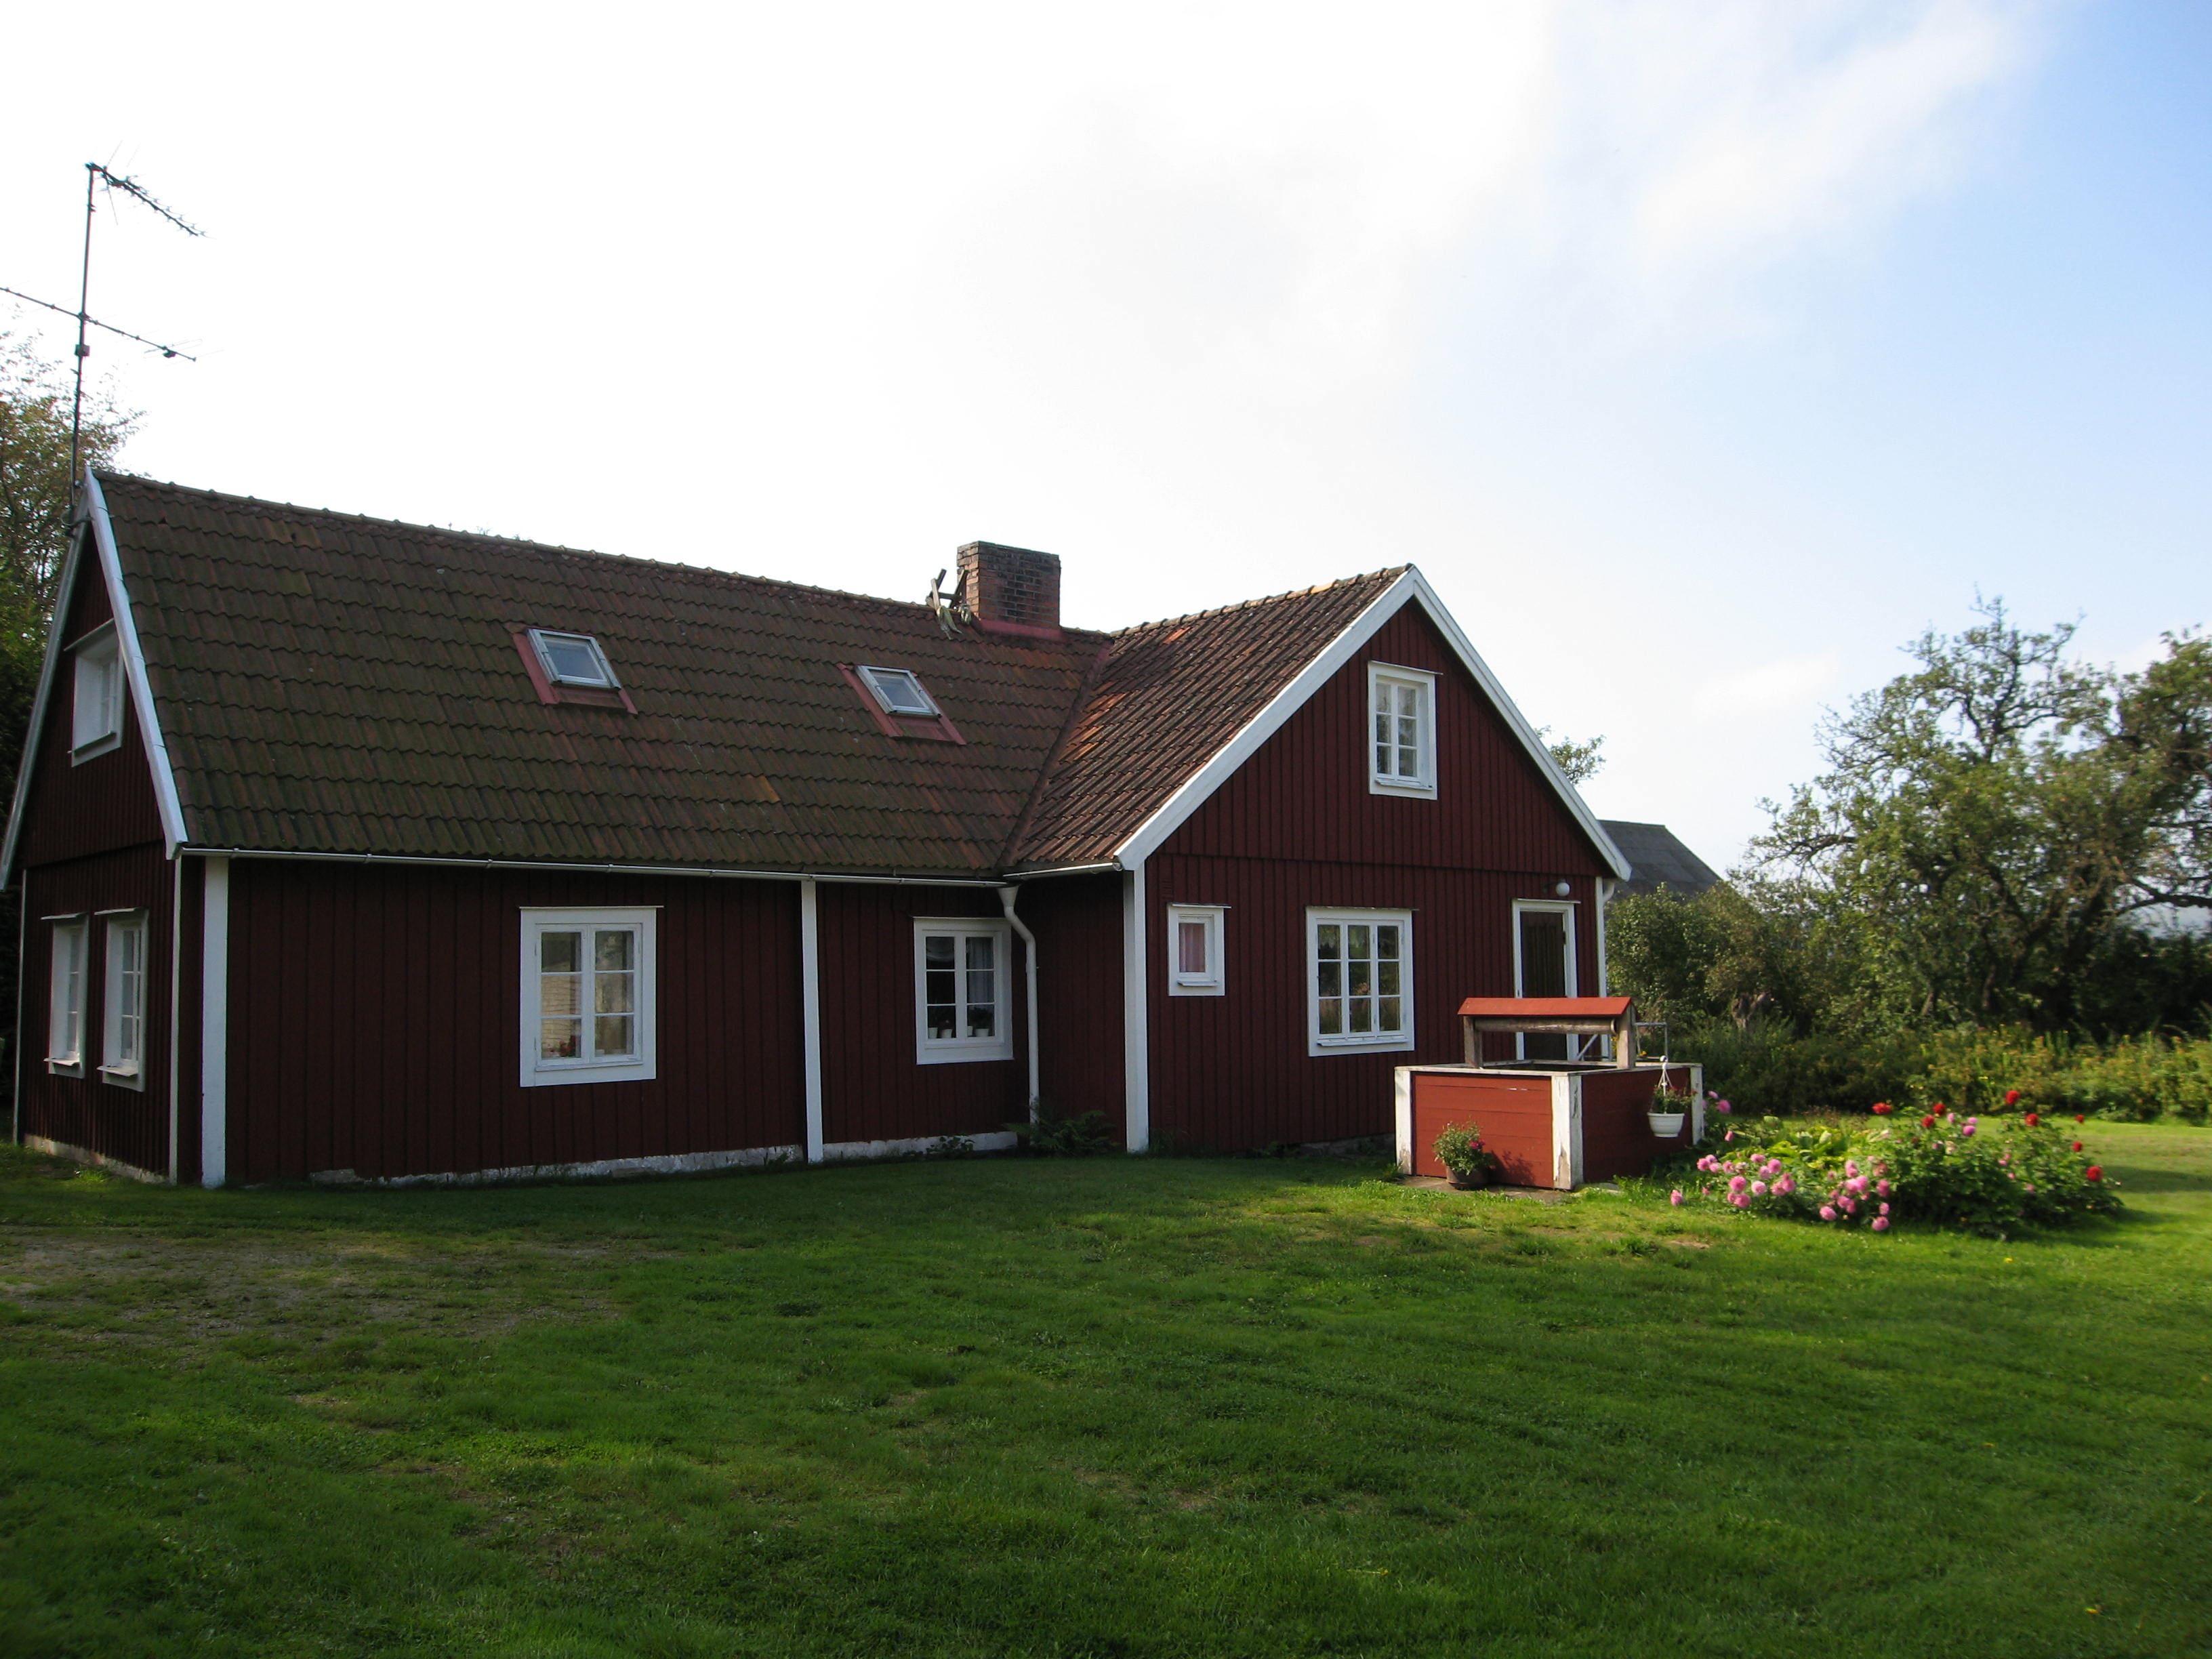 SK6001 Näsum, Olofström